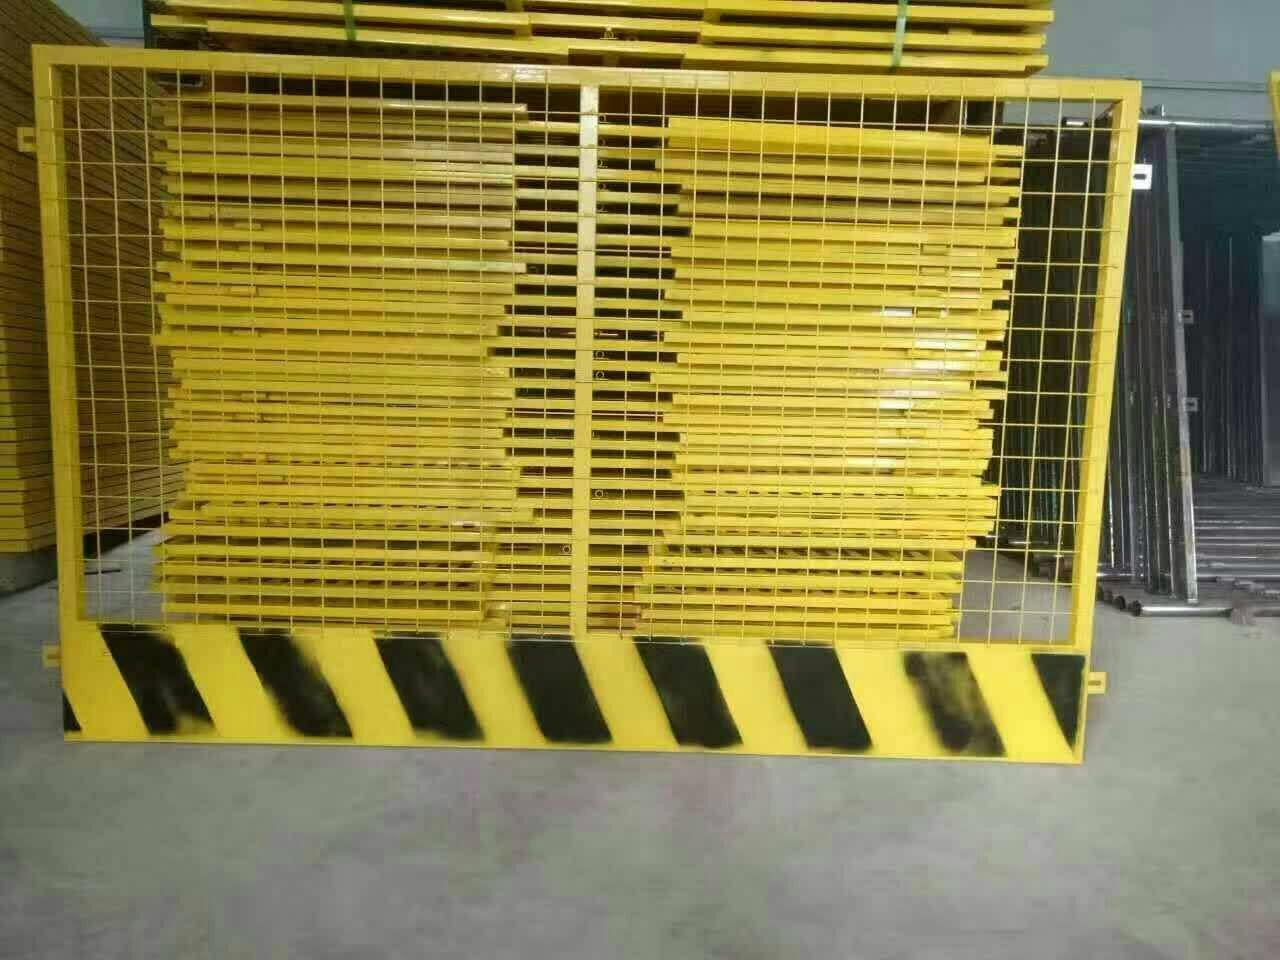 供应基坑护栏网 5